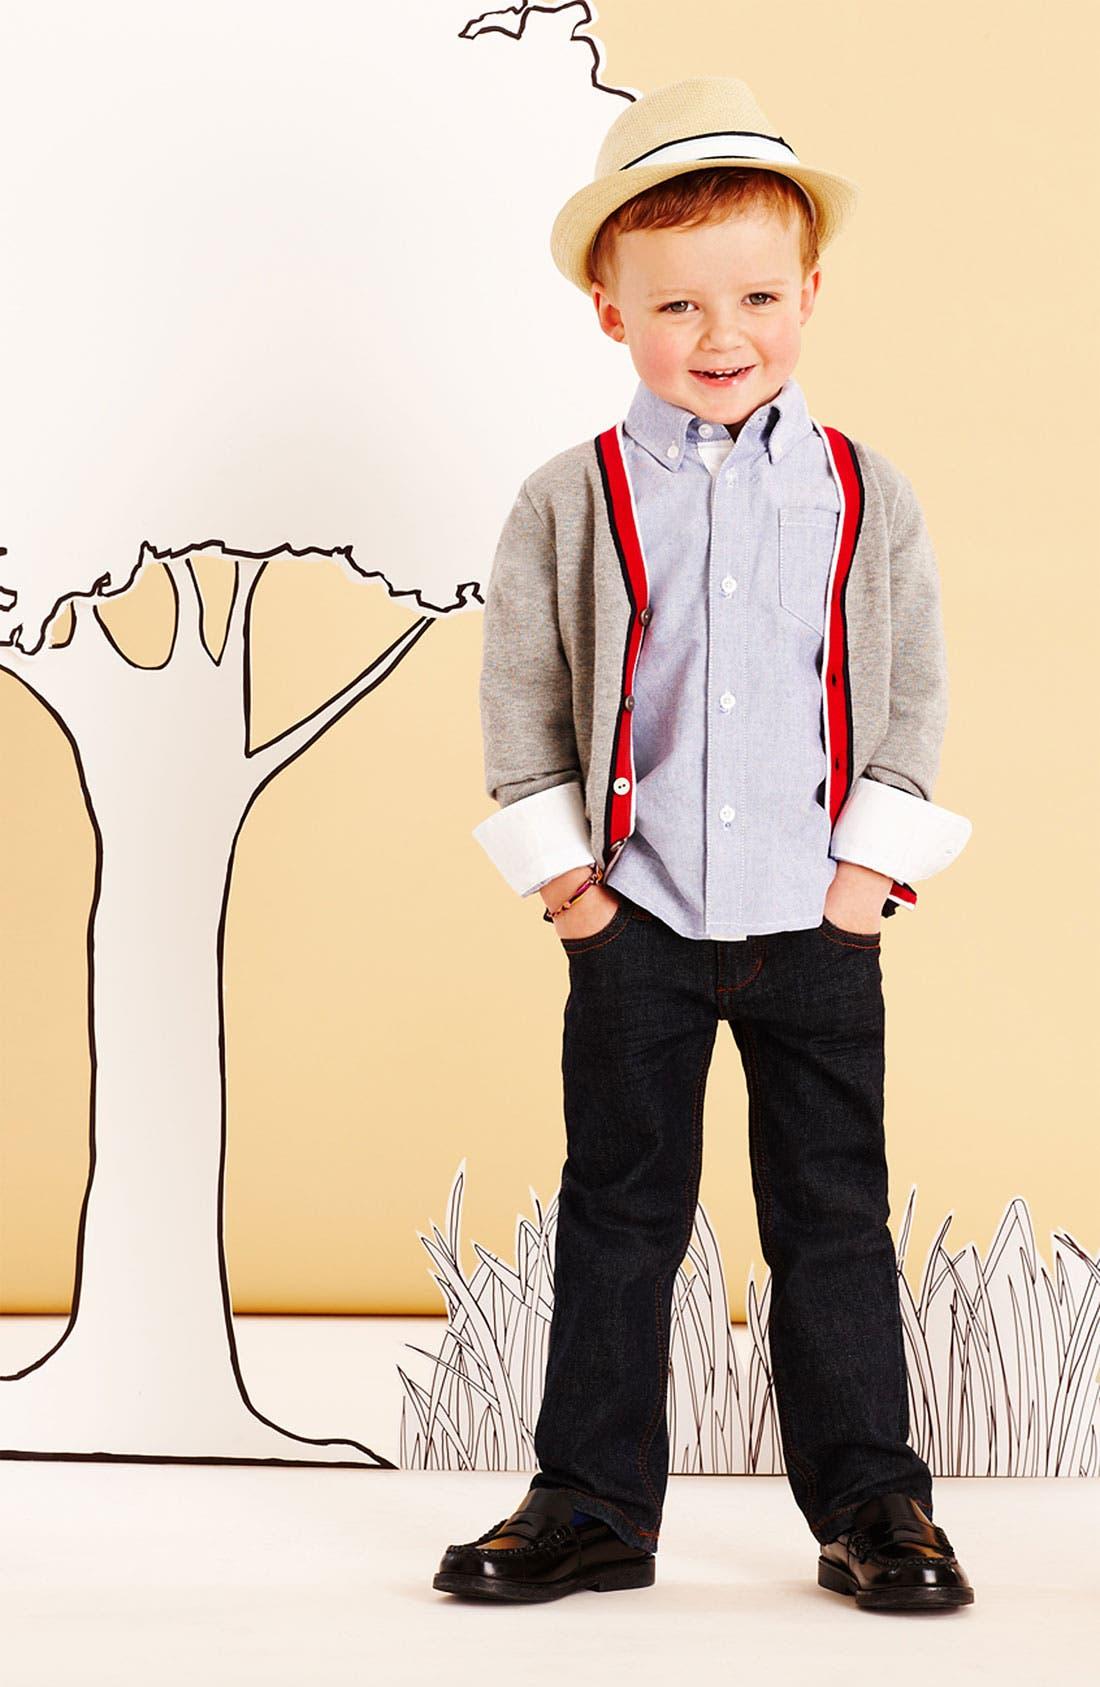 Main Image - Sovereign Code Cardigan, Woven Shirt & Joe's Jeans (Toddler)